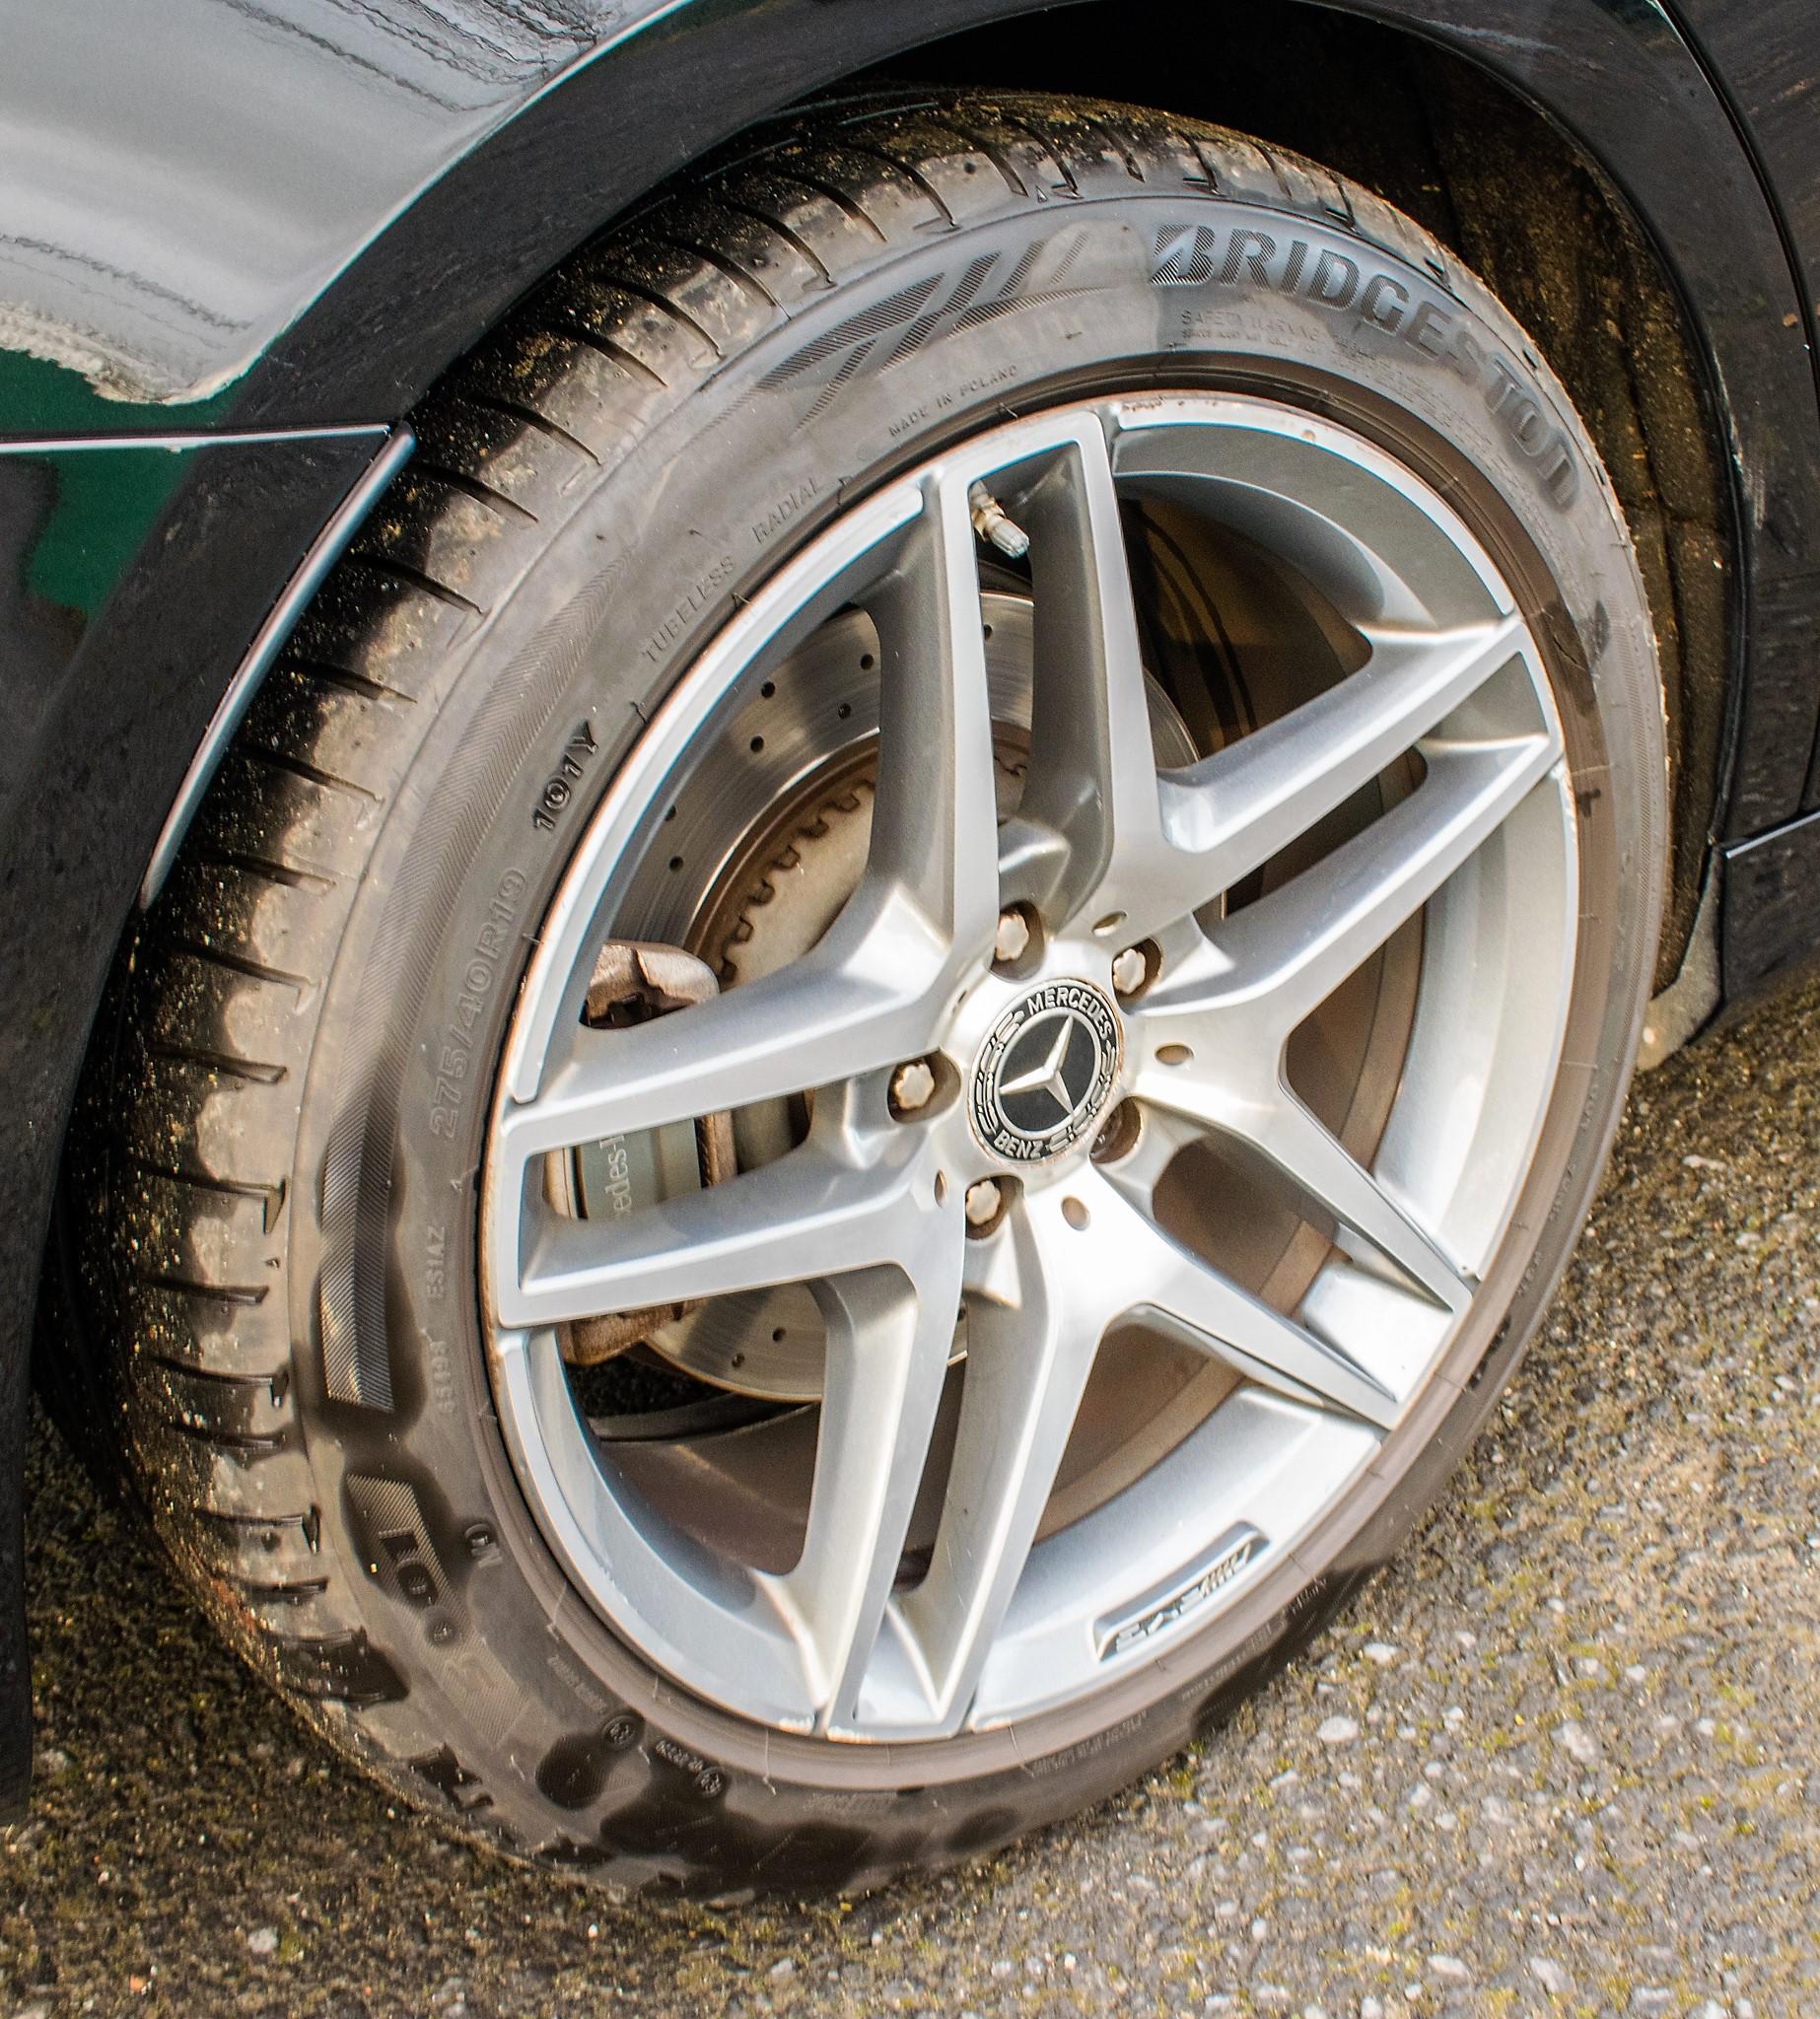 Mercedes Benz S450 L AMG Line Executive auto petrol 4 door saloon car Registration Number: FX68 - Image 15 of 33